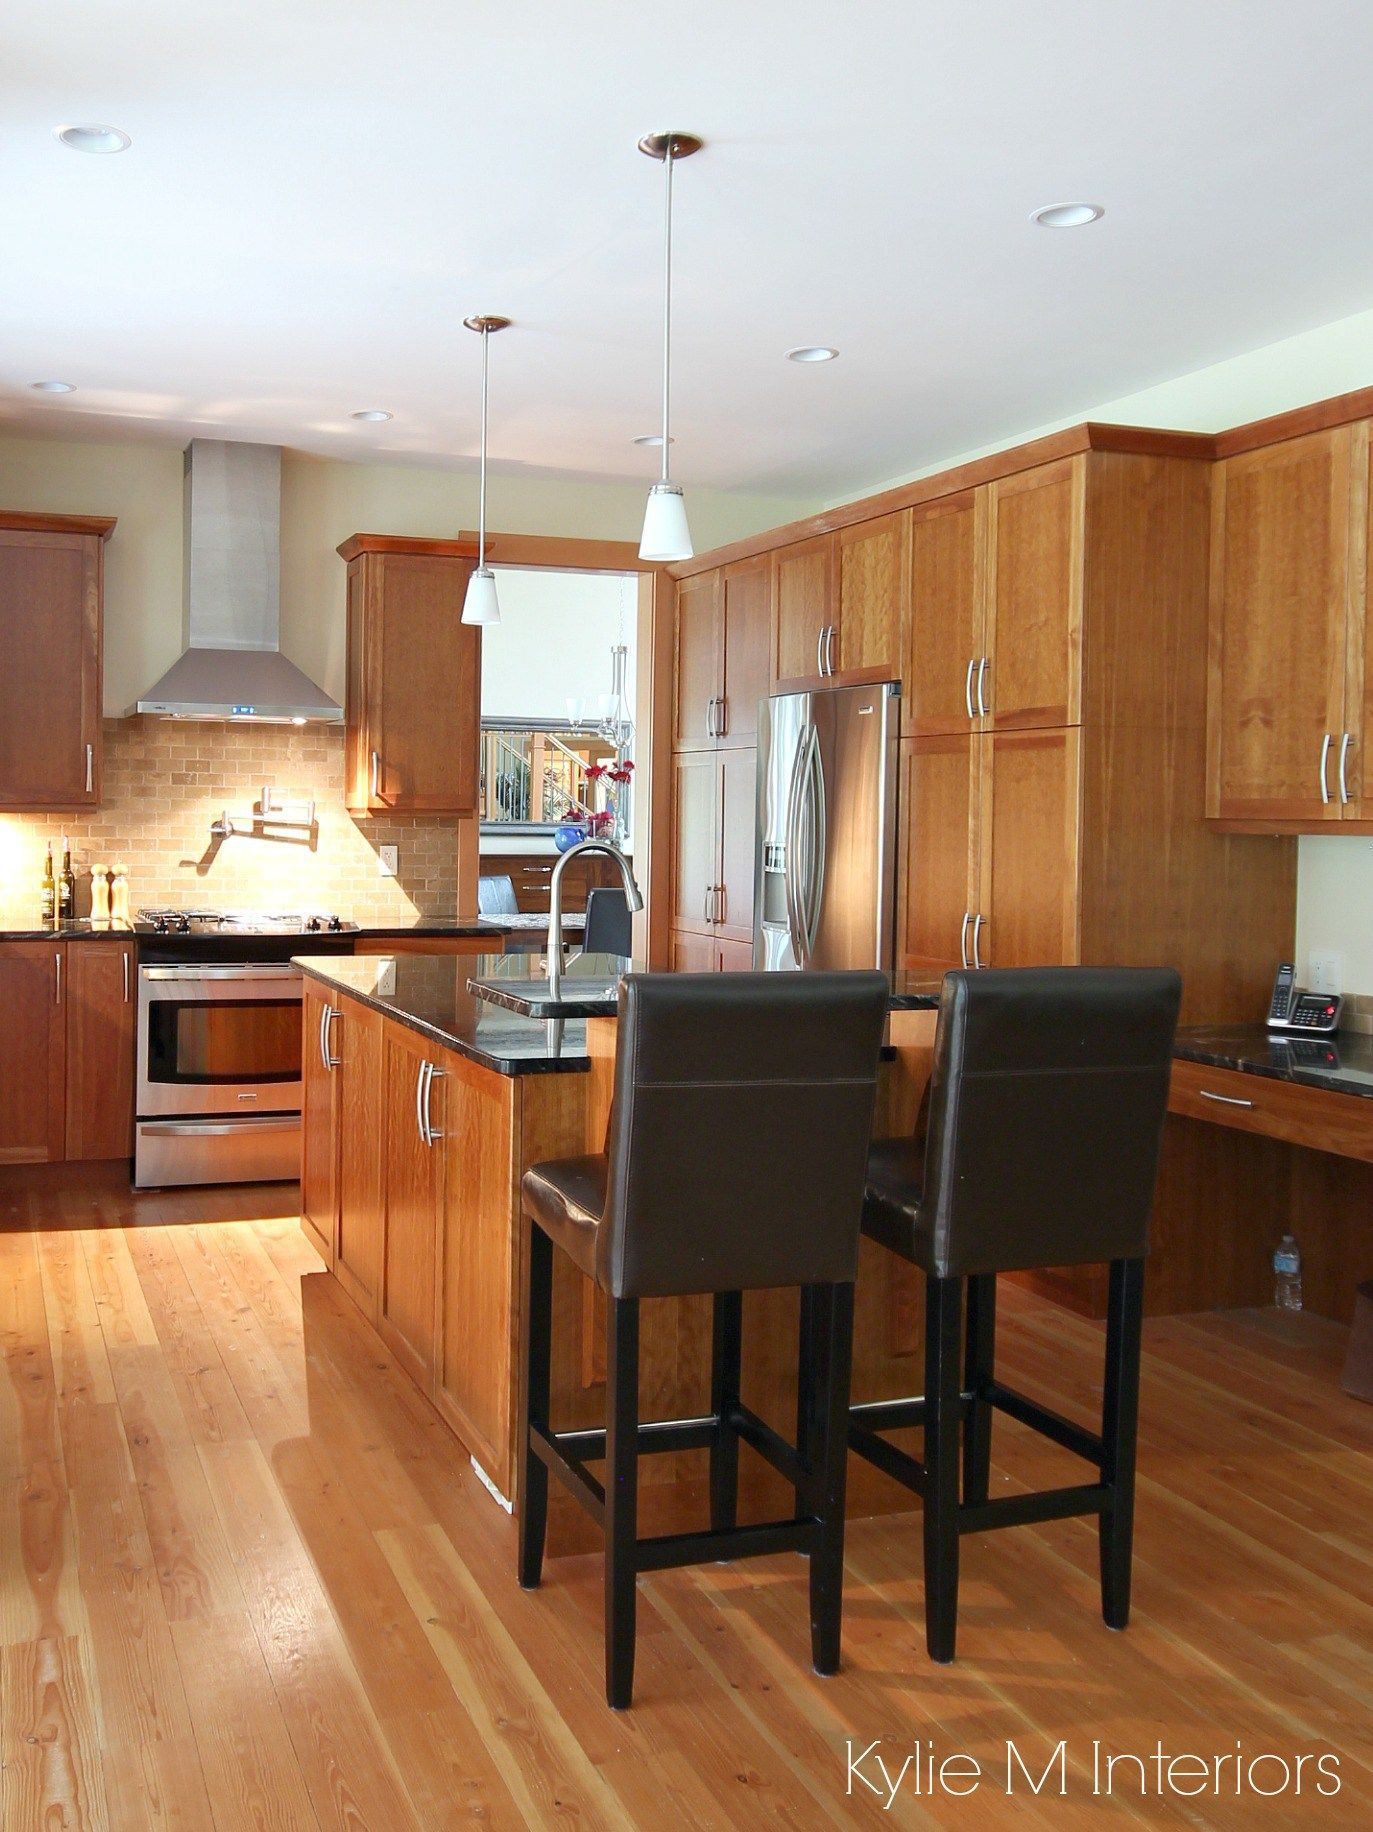 A beautiful wood and granite kitchen design helpful hints